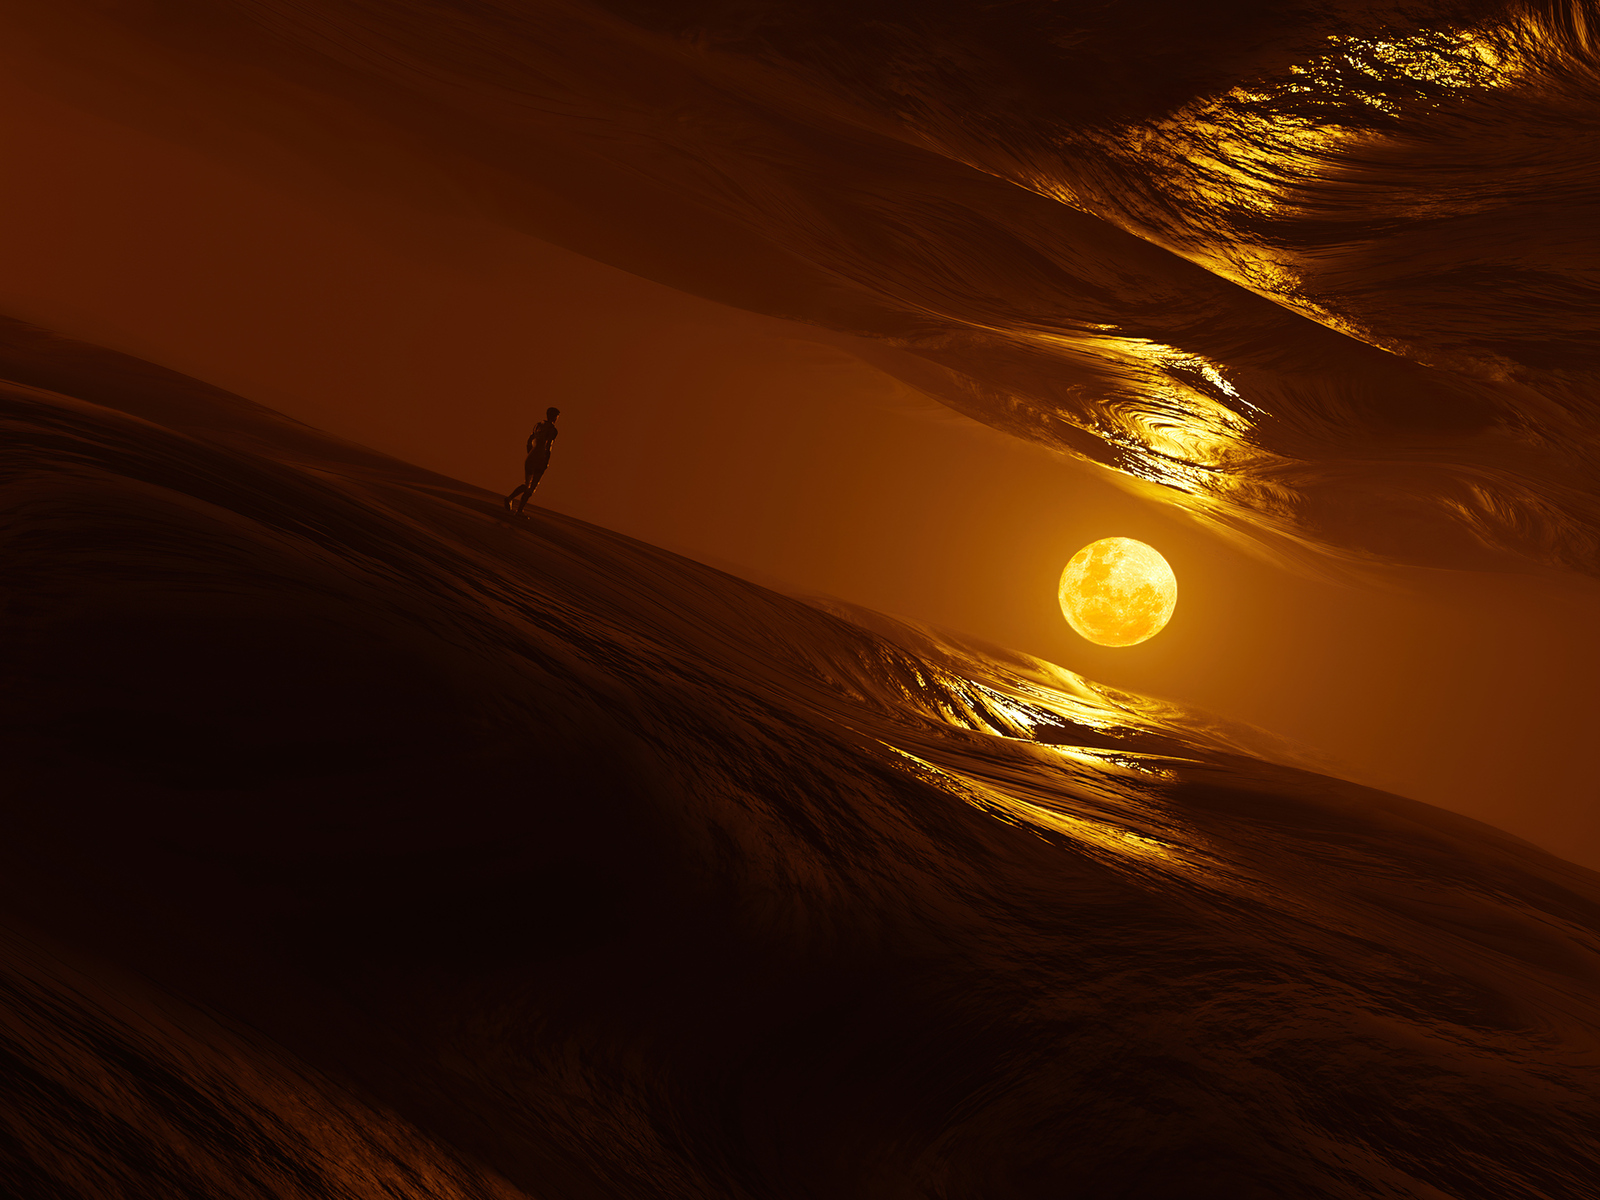 walking-on-waves-moonlight-4k-0b.jpg